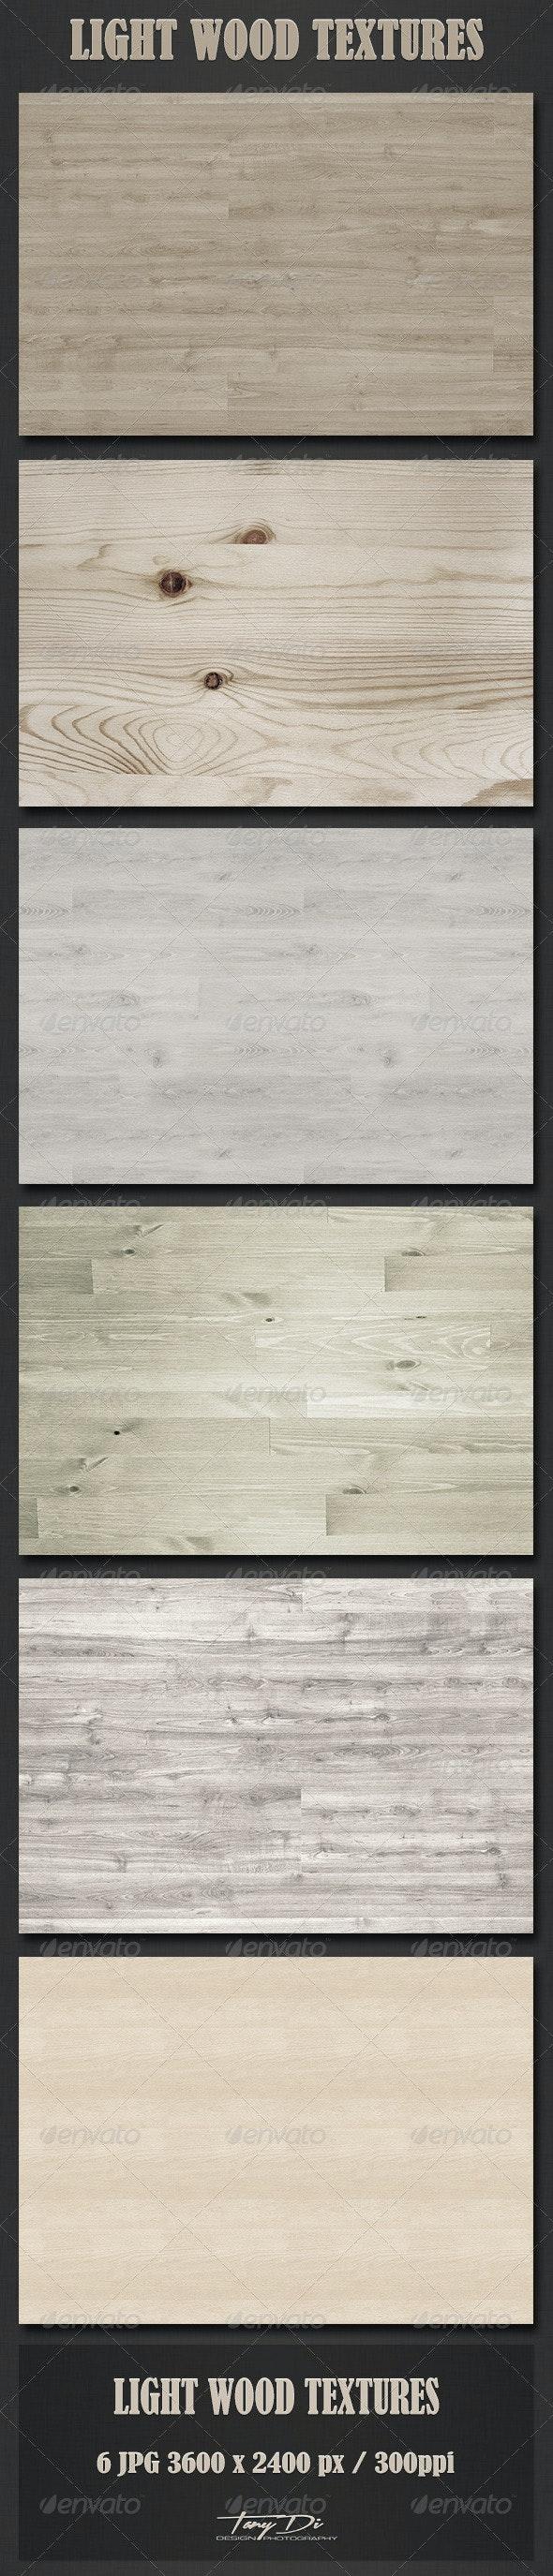 Light Wood Textures - Wood Textures